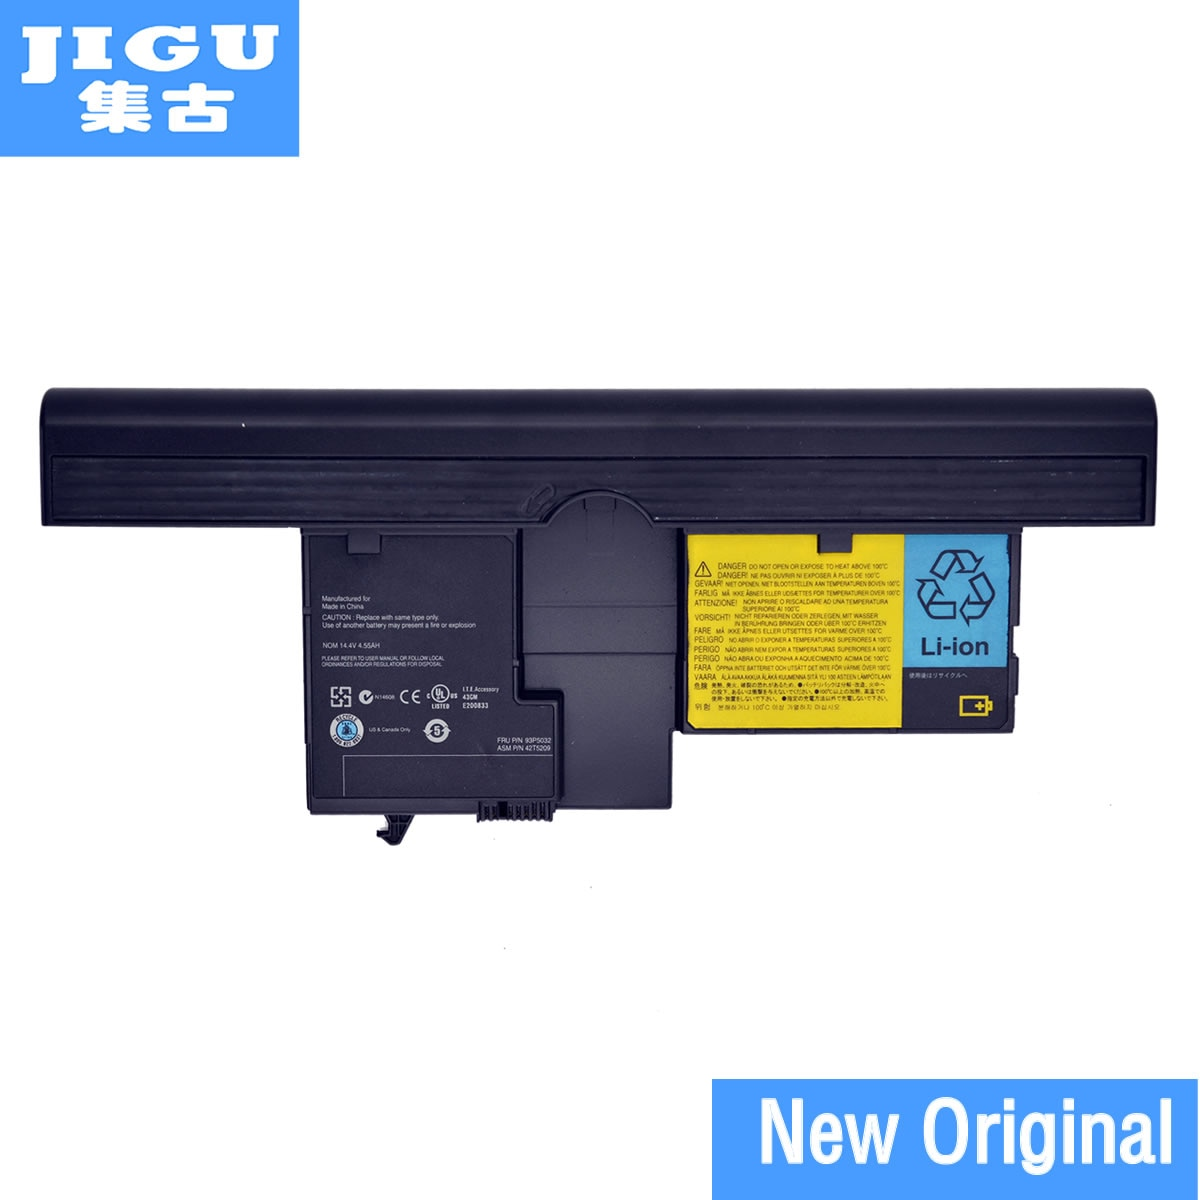 JIGU 40Y8314 40Y8318 42T5209 42T5204 42T5206 42T5208 Original laptop Batterie Für Lenovo für ThinkPad X60T X61T X60 X61 Tablet PC